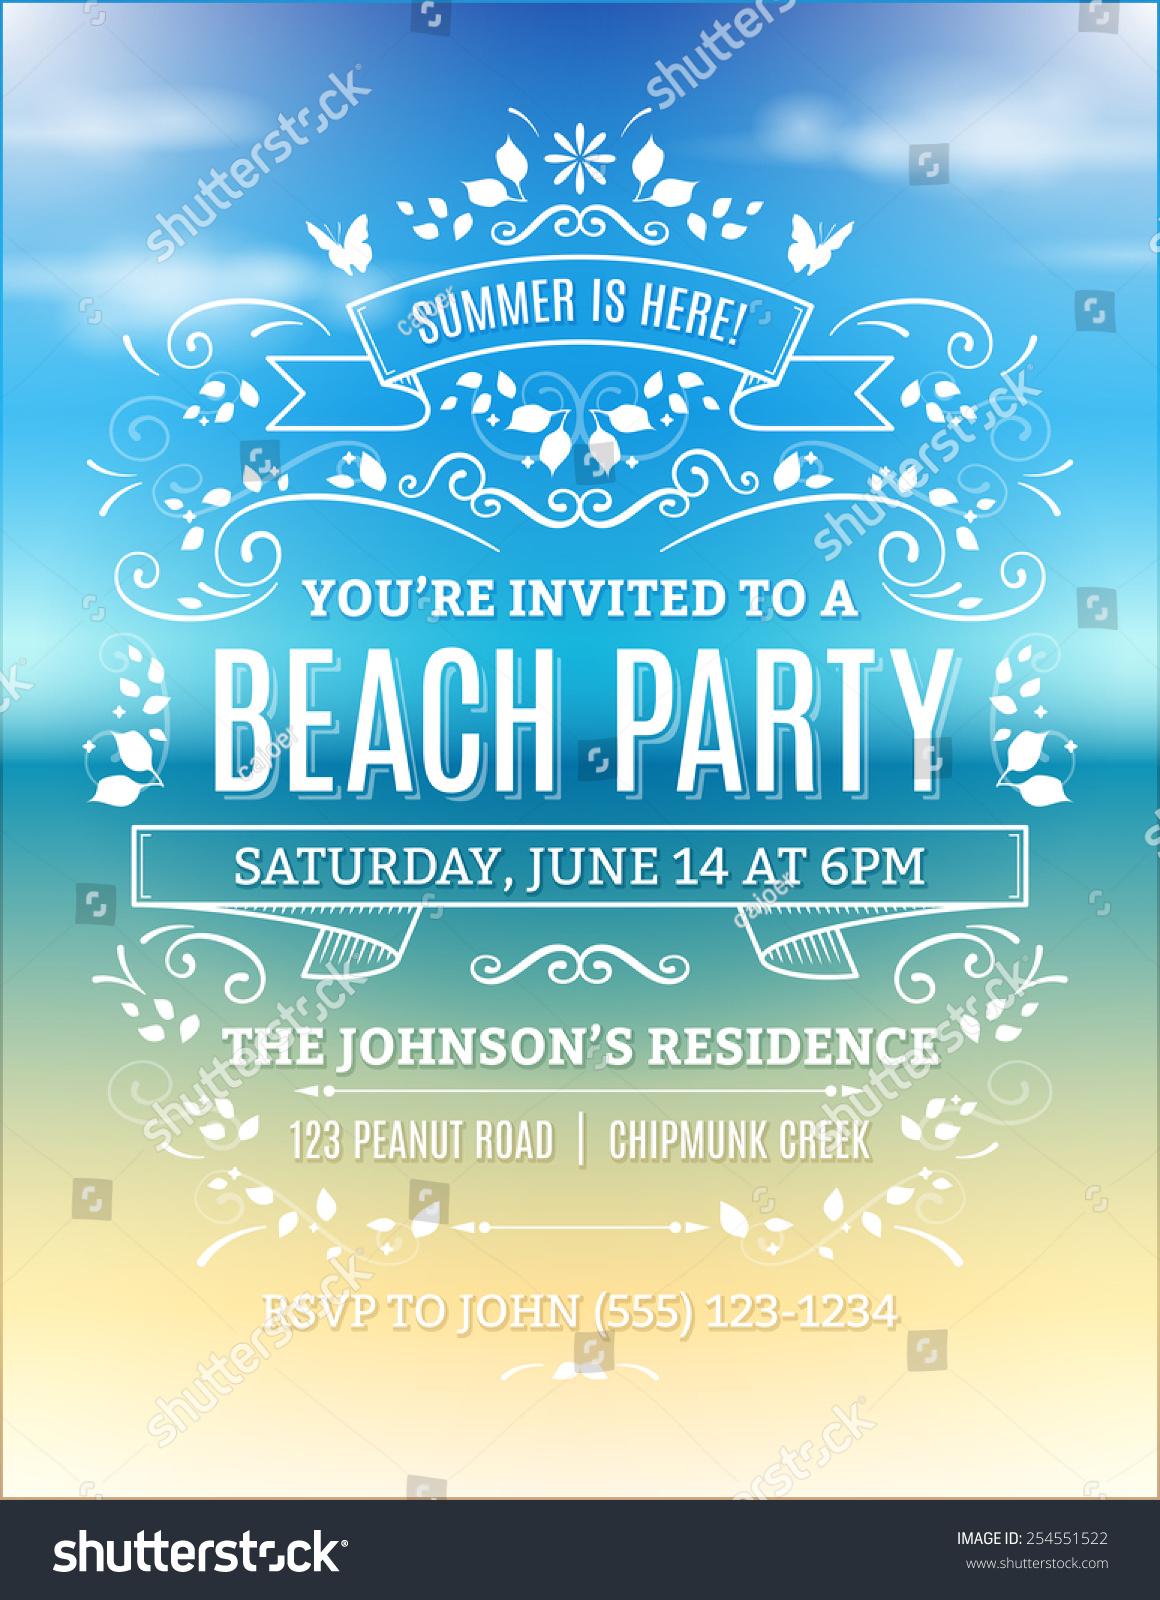 Free Printable Invitaions was best invitations design